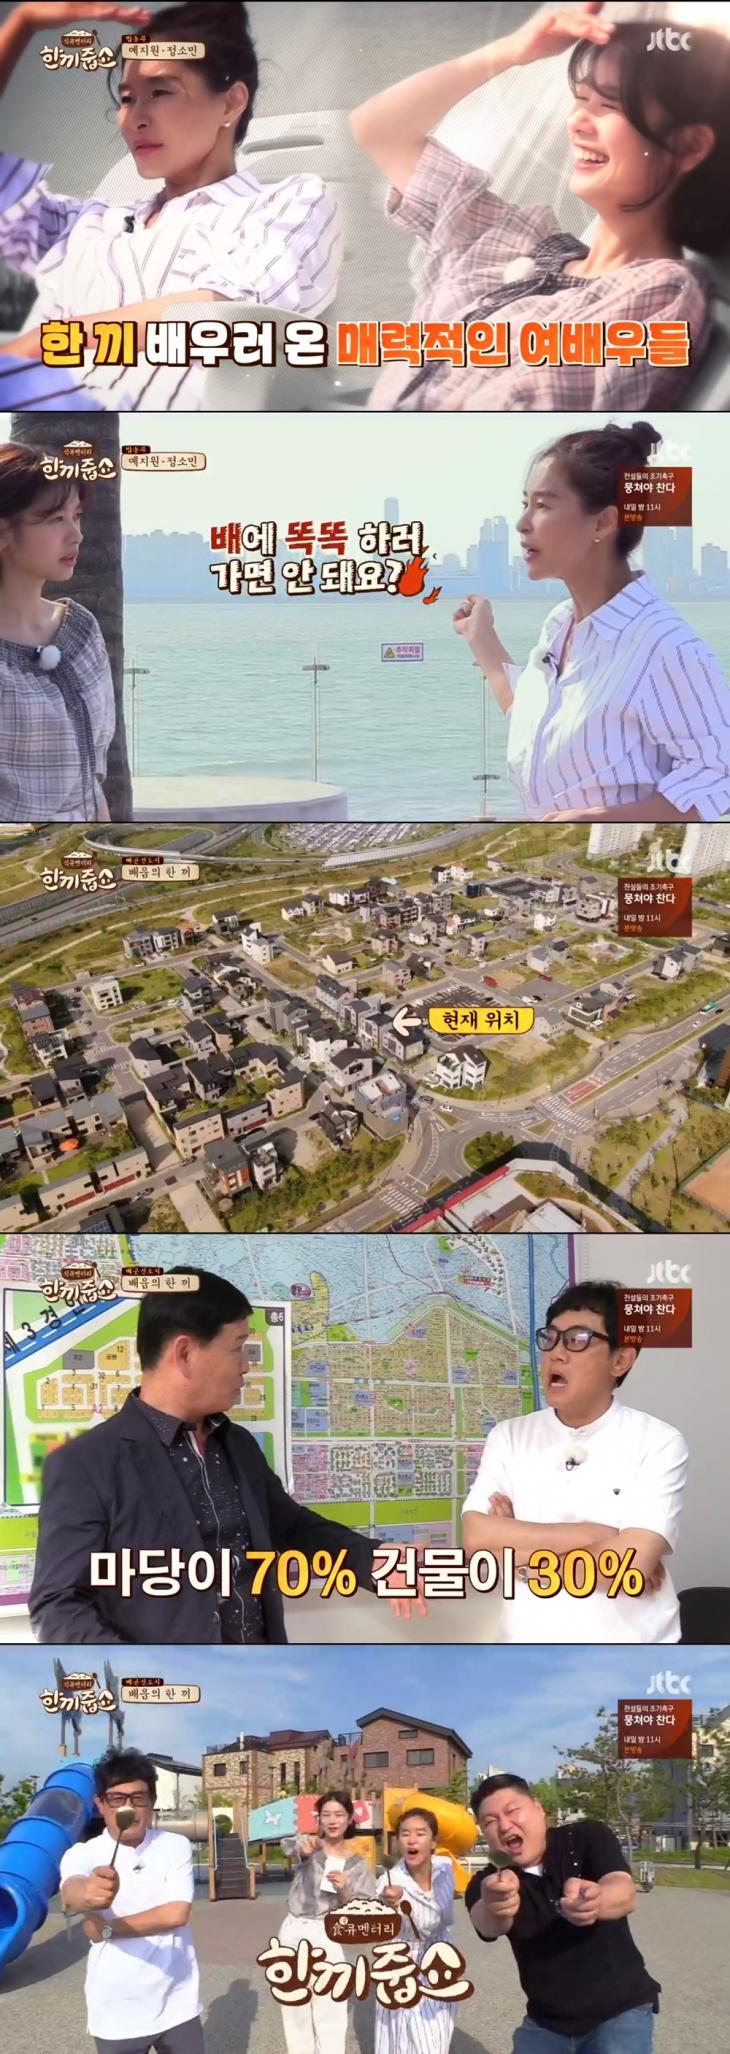 JTBC '한끼줍쇼' 방송 캡쳐